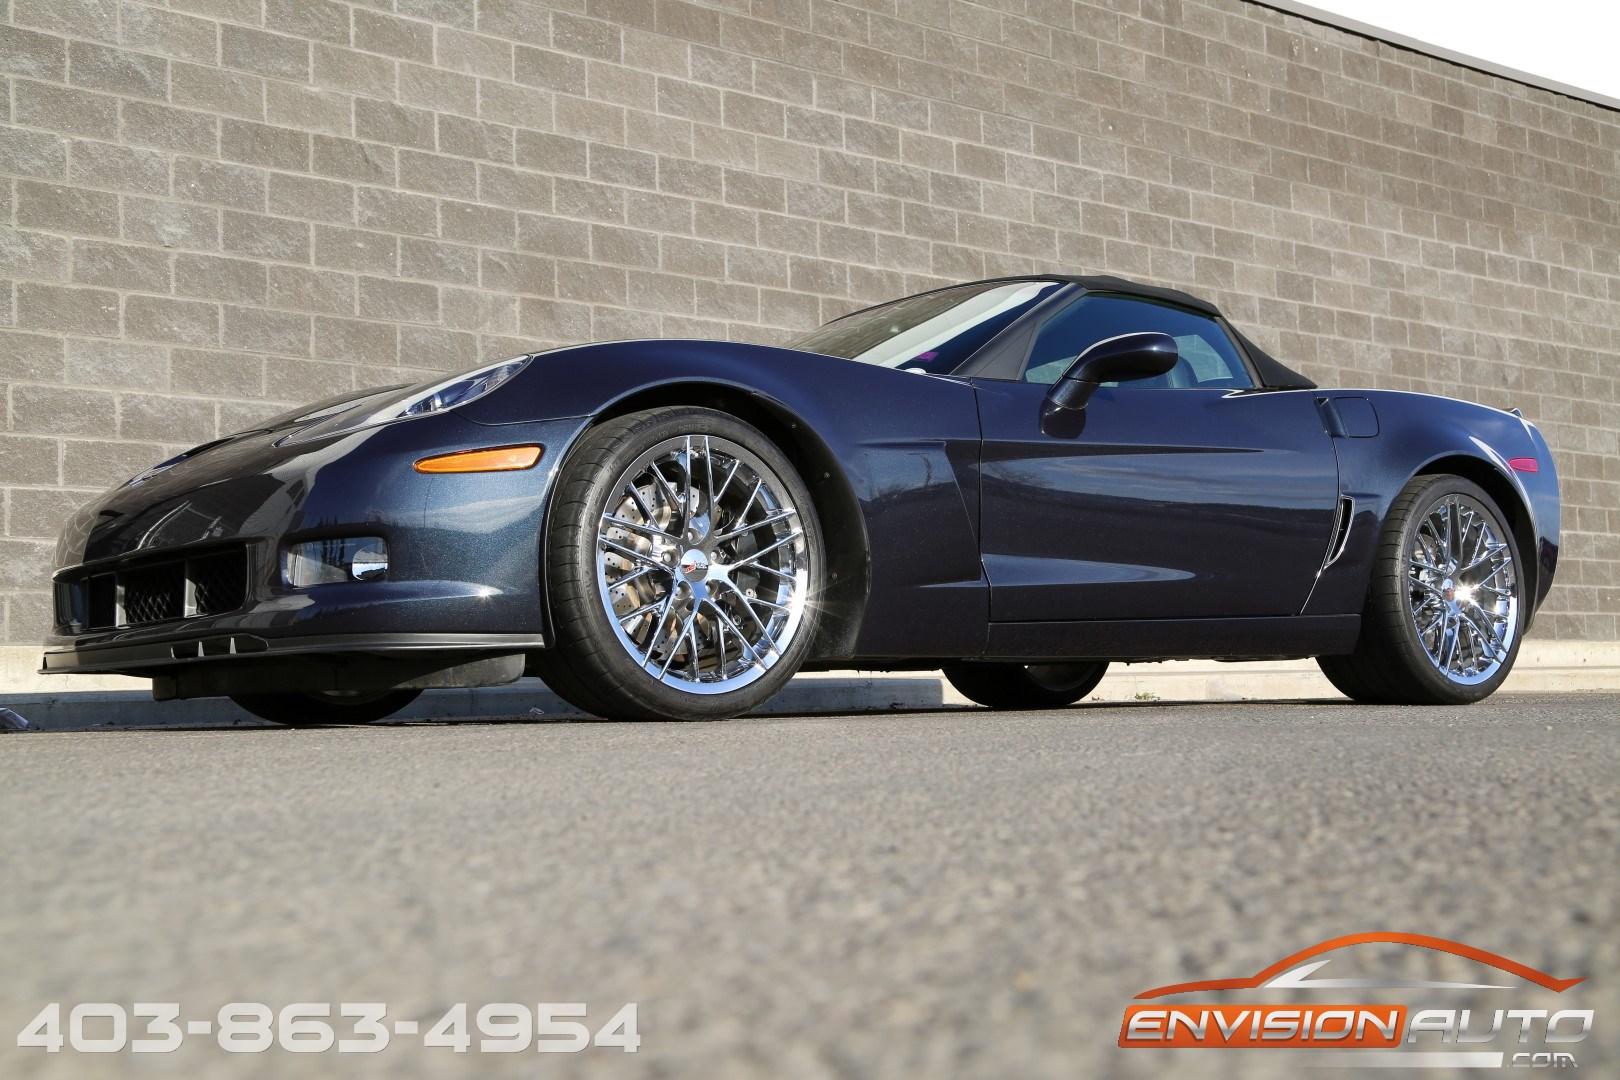 2013 Chevrolet Corvette 427 Convertible 7 0l V8 Ls7